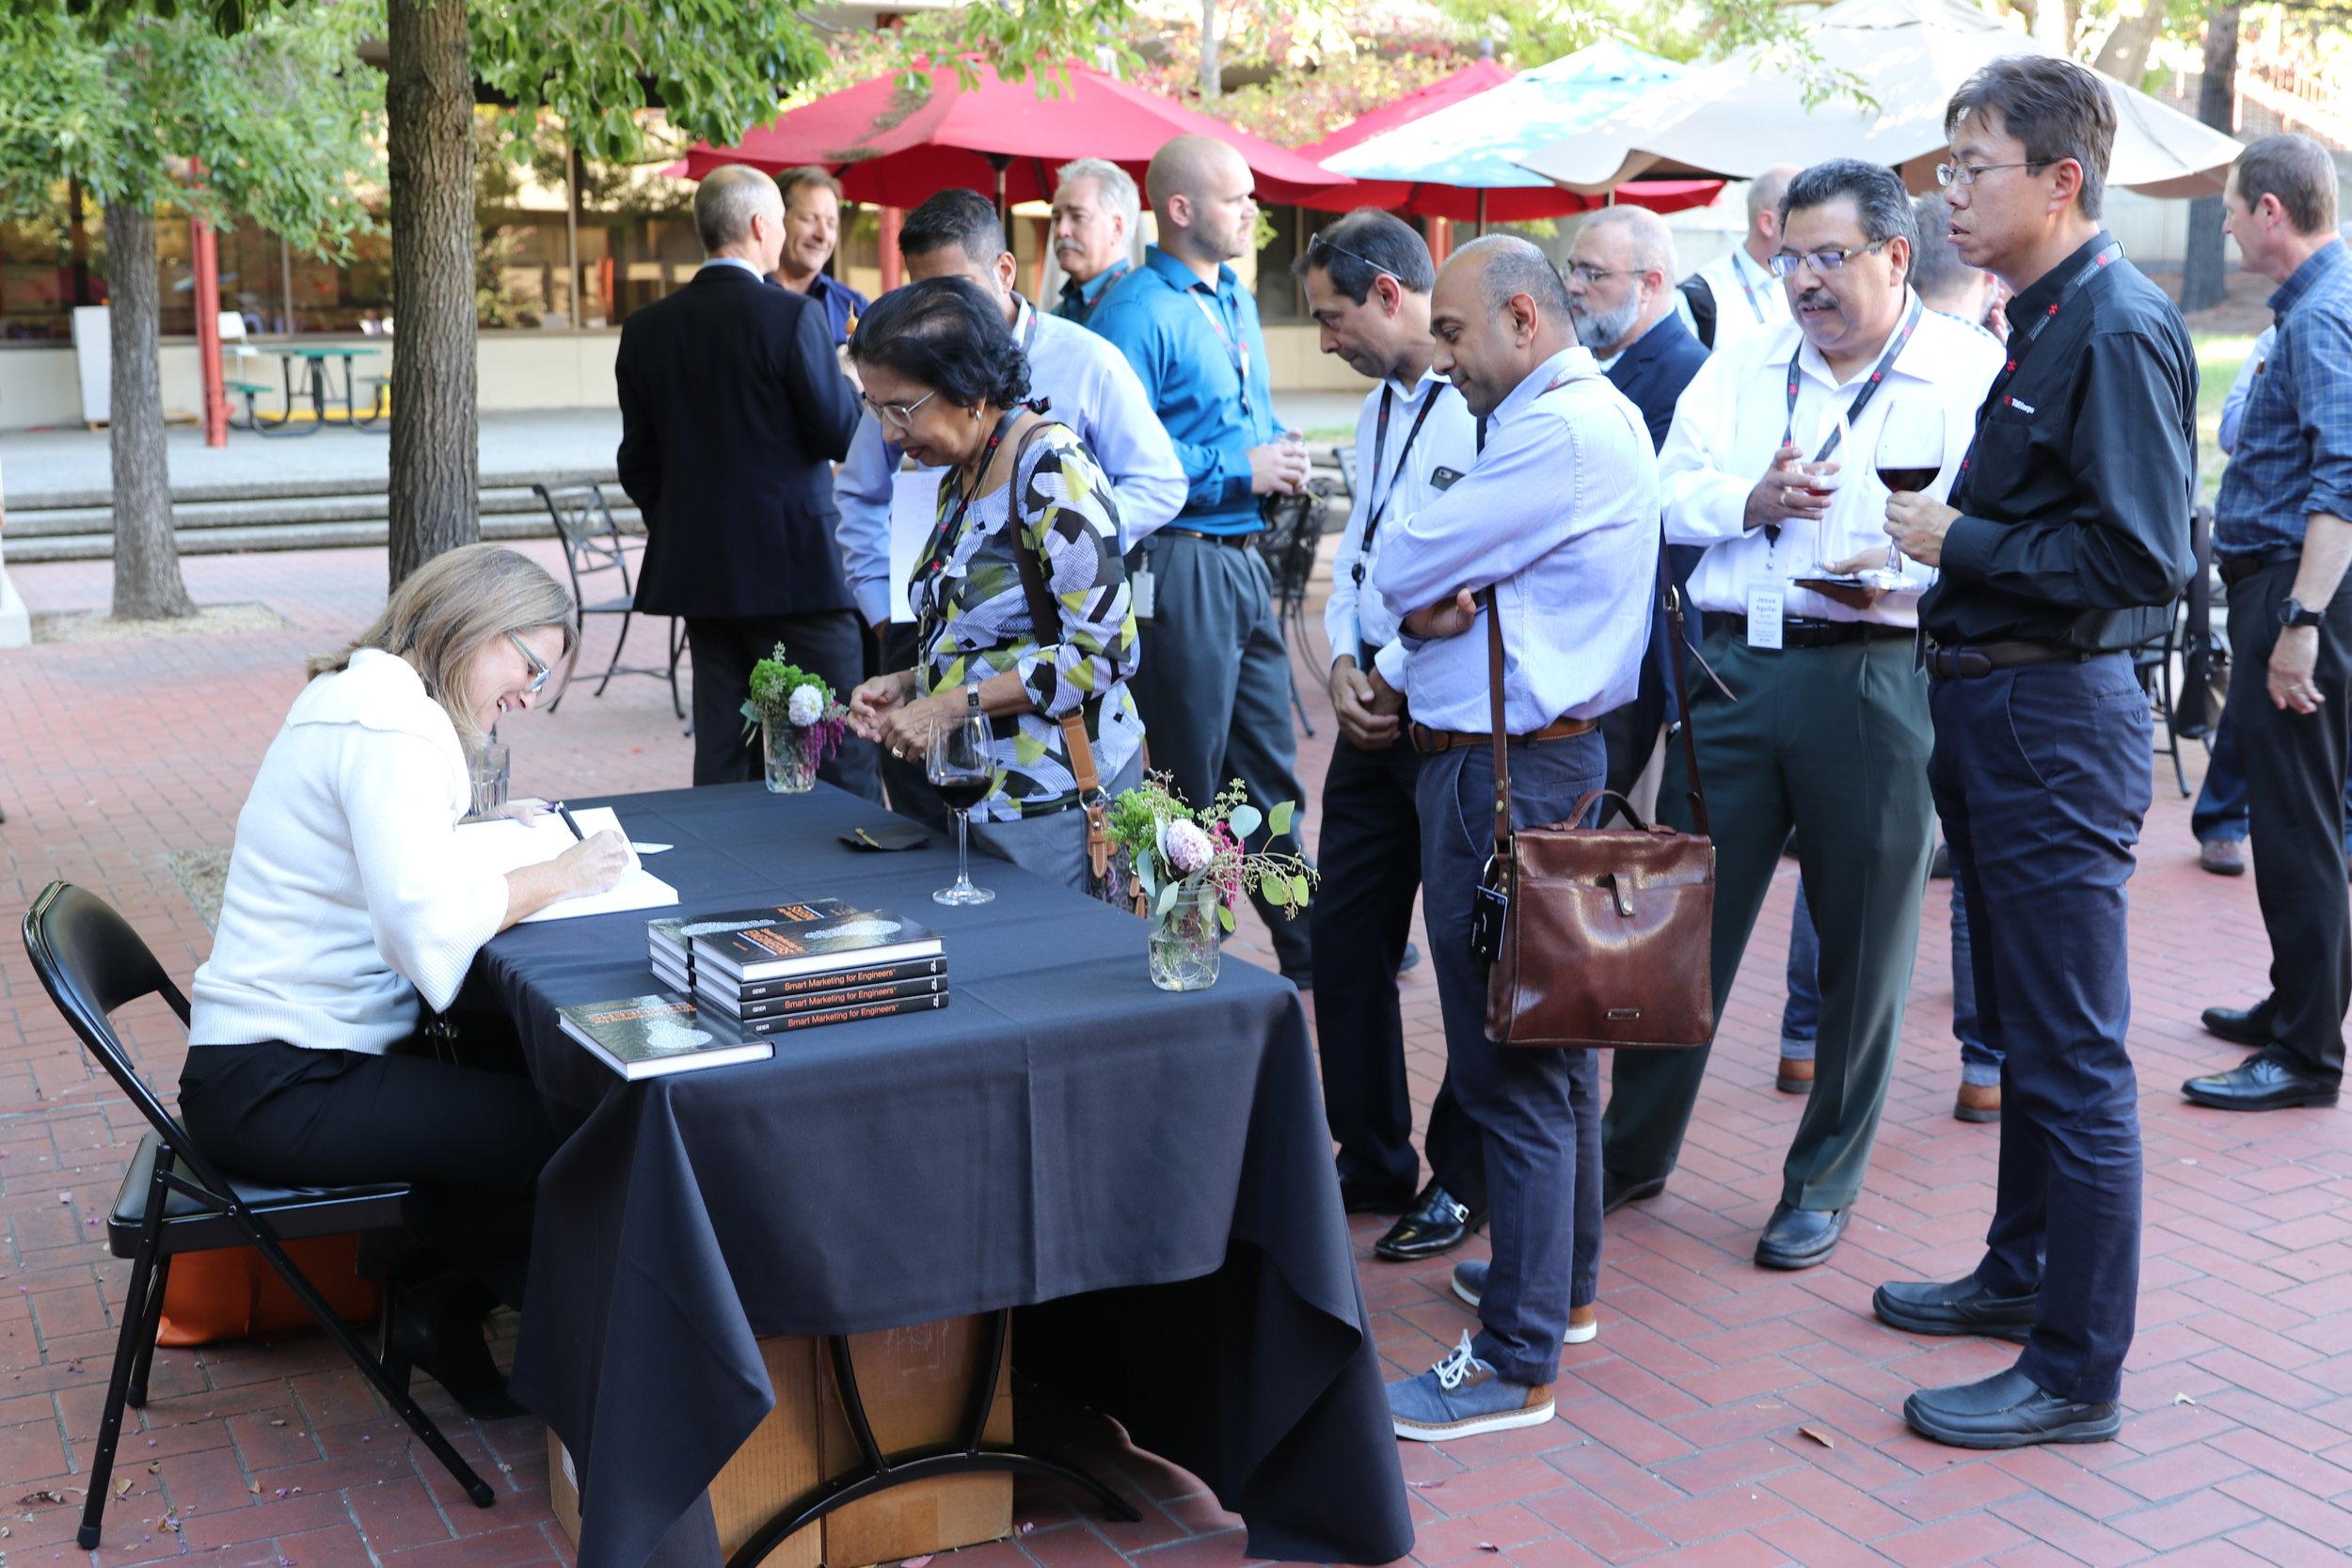 Book signing on the patio at Keysight Technologies HQ in Santa Rosa, CA.